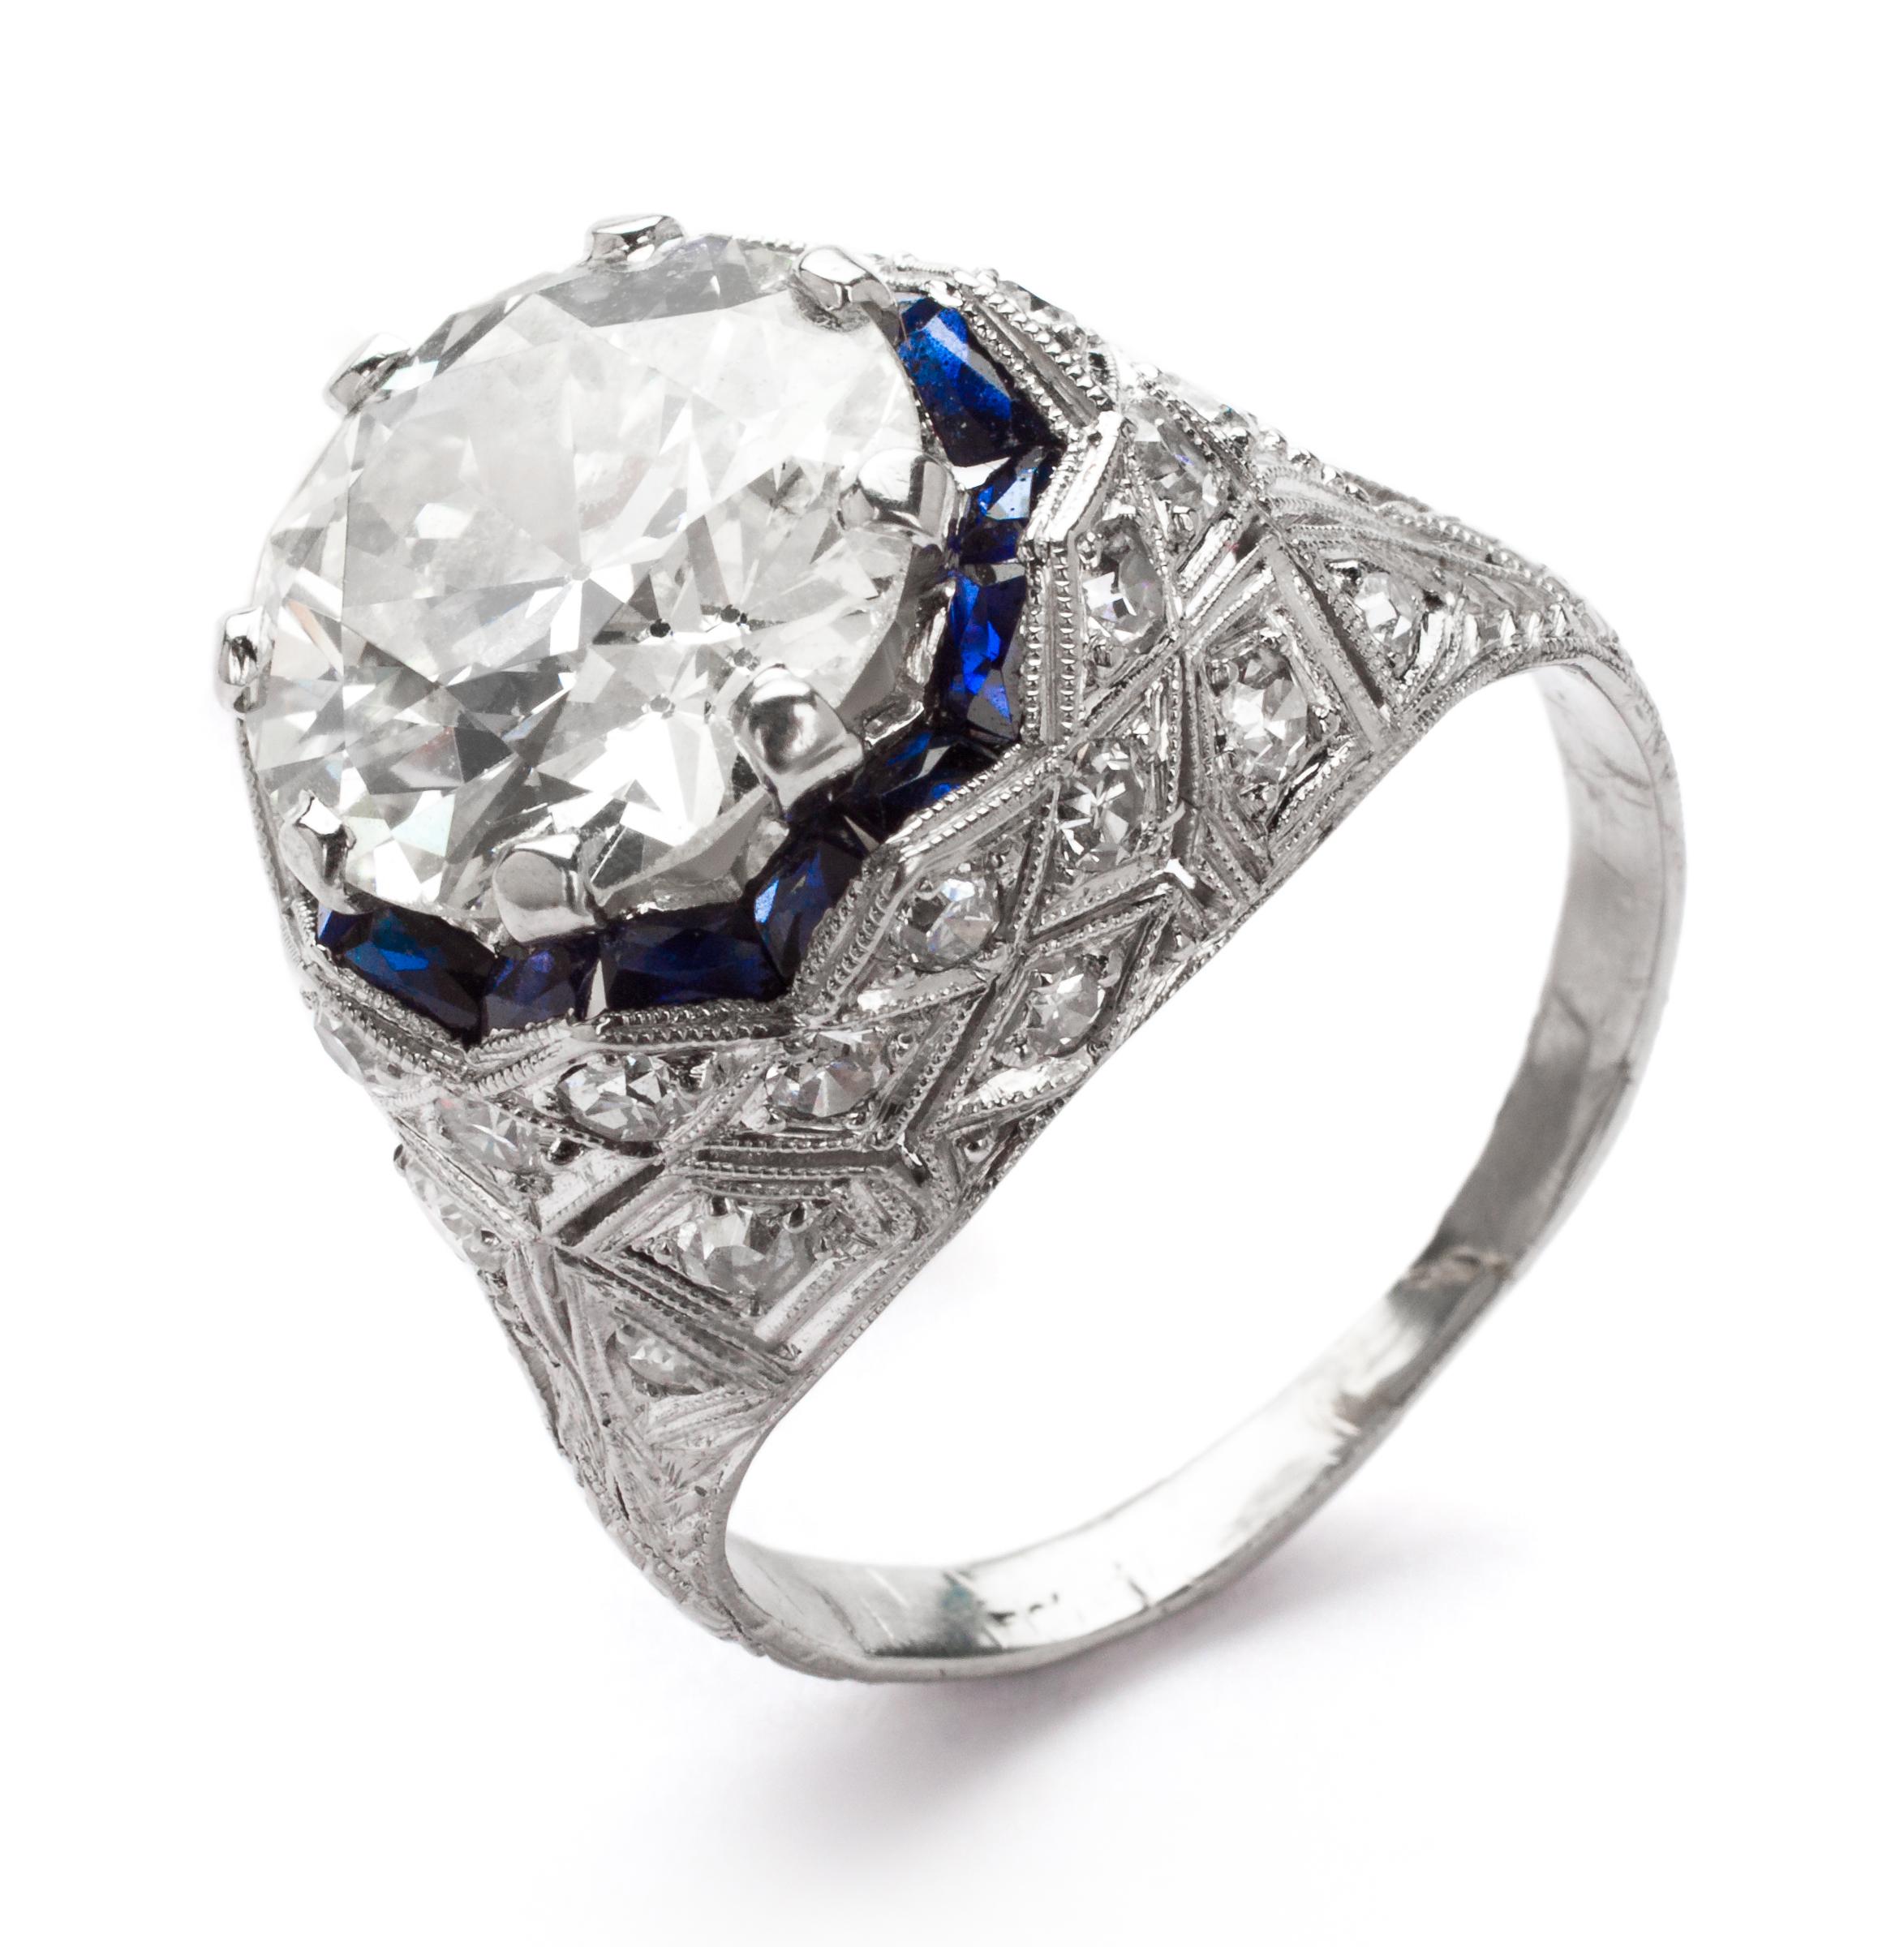 Art Deco Diamond and Platinum Engagement Ring